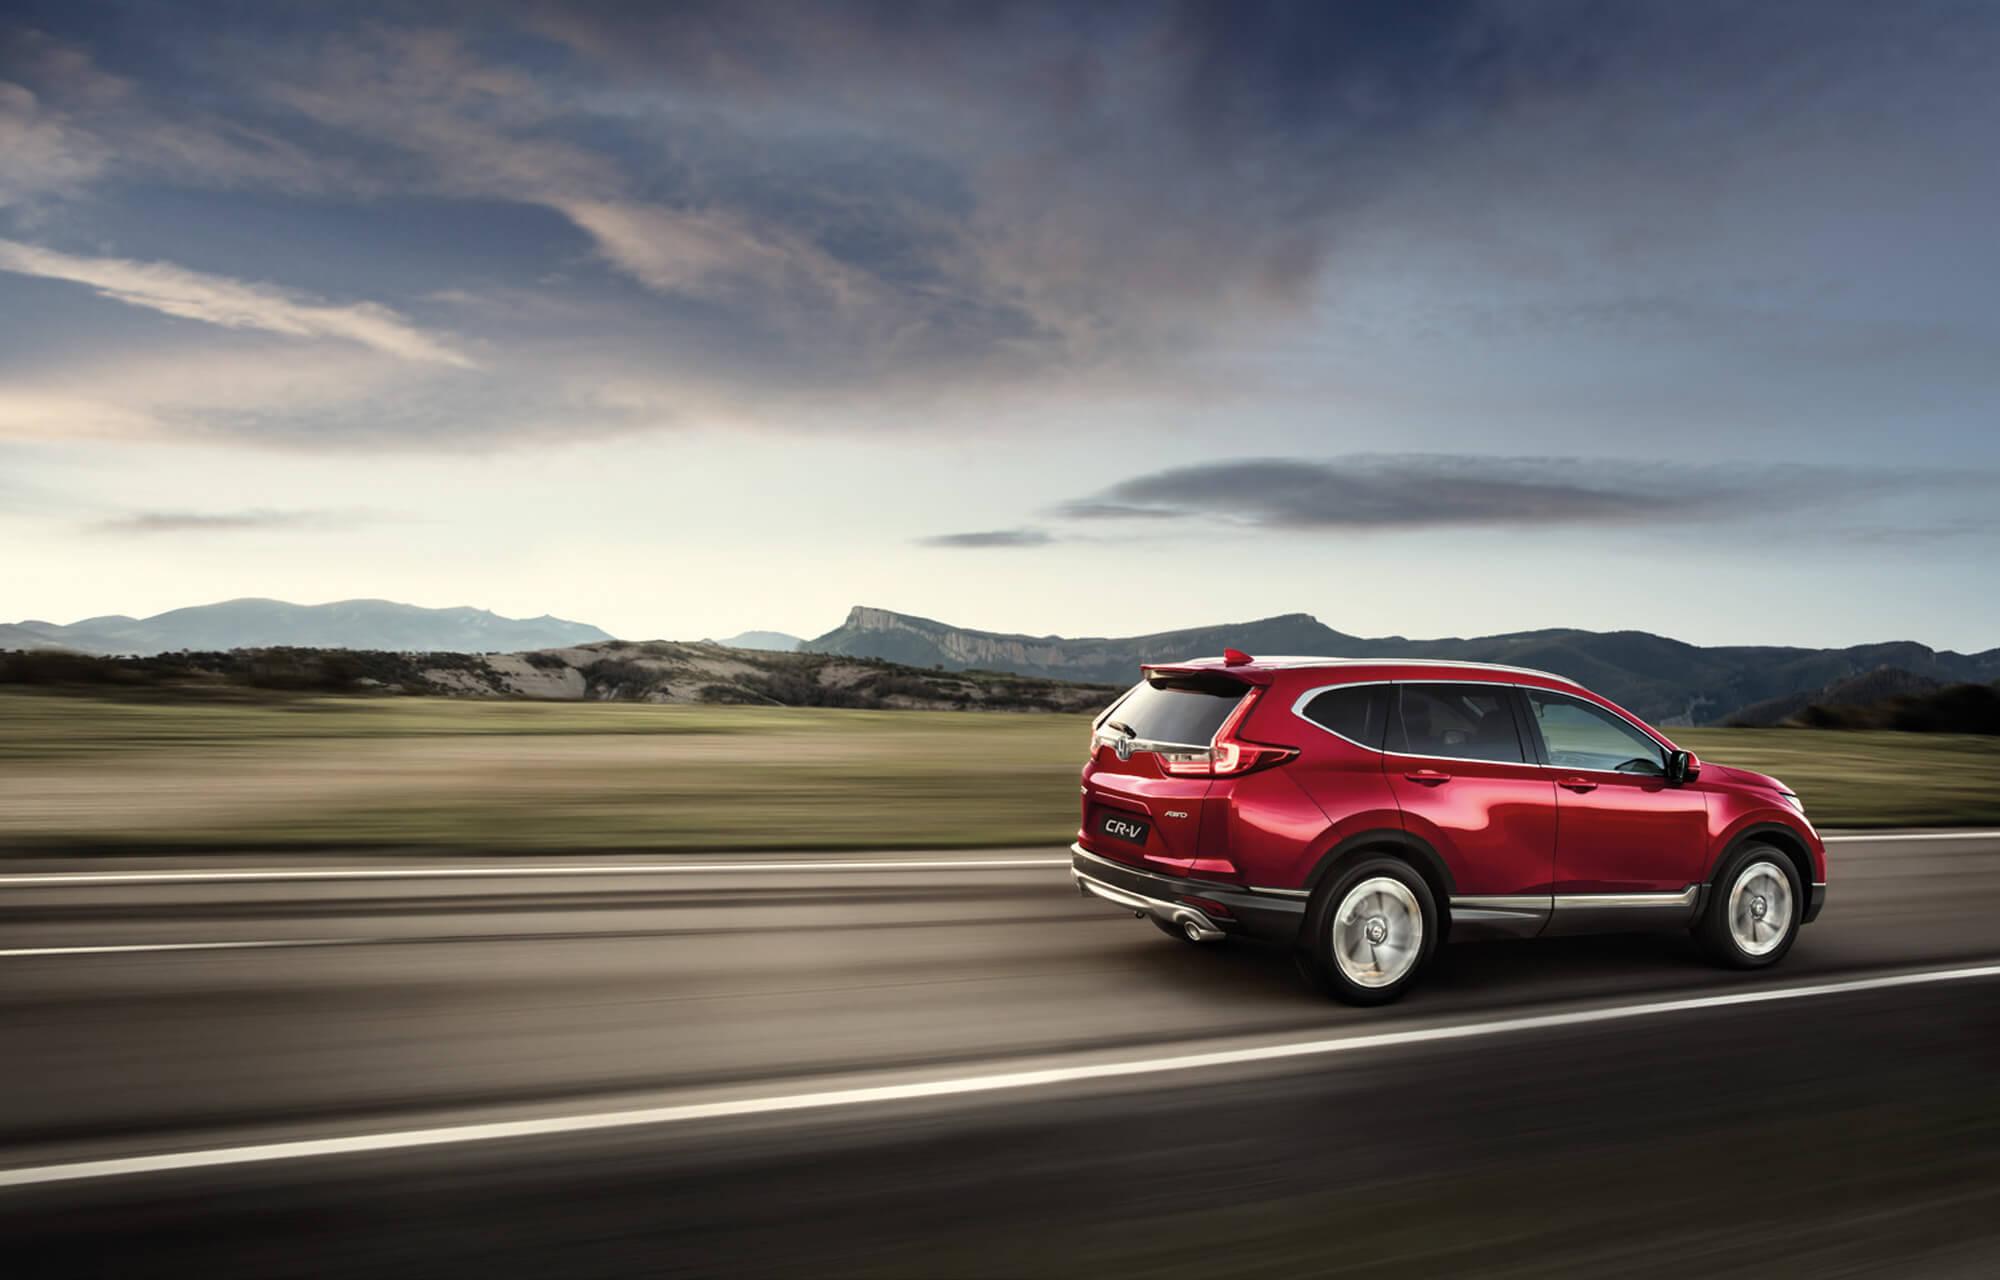 The all-new Honda CR-V